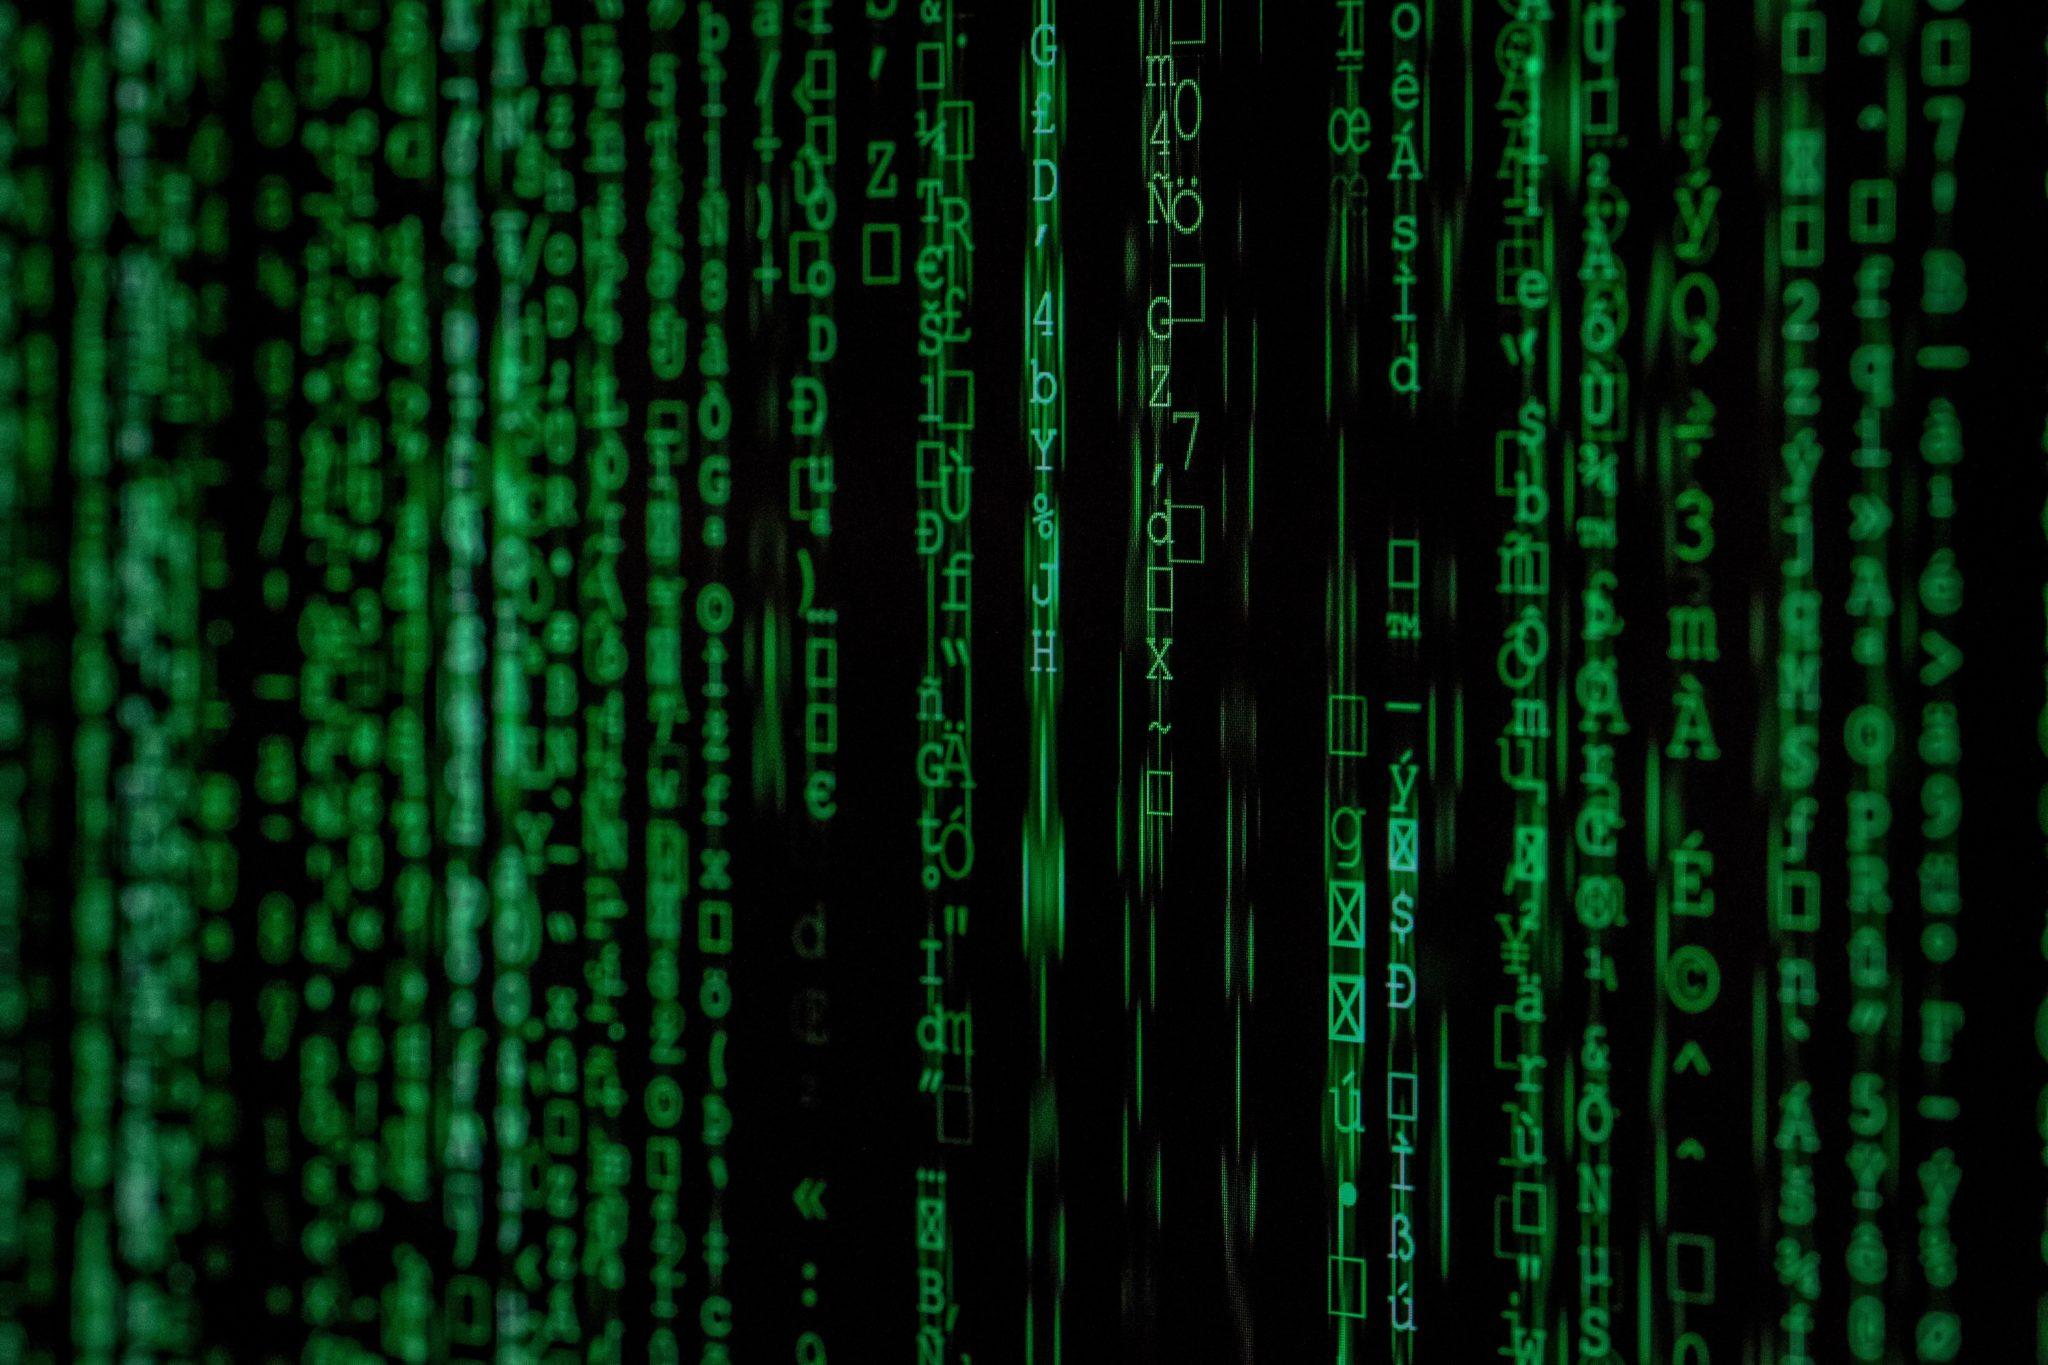 """Matrix"" Photo by Markus Spiske on Unsplash"